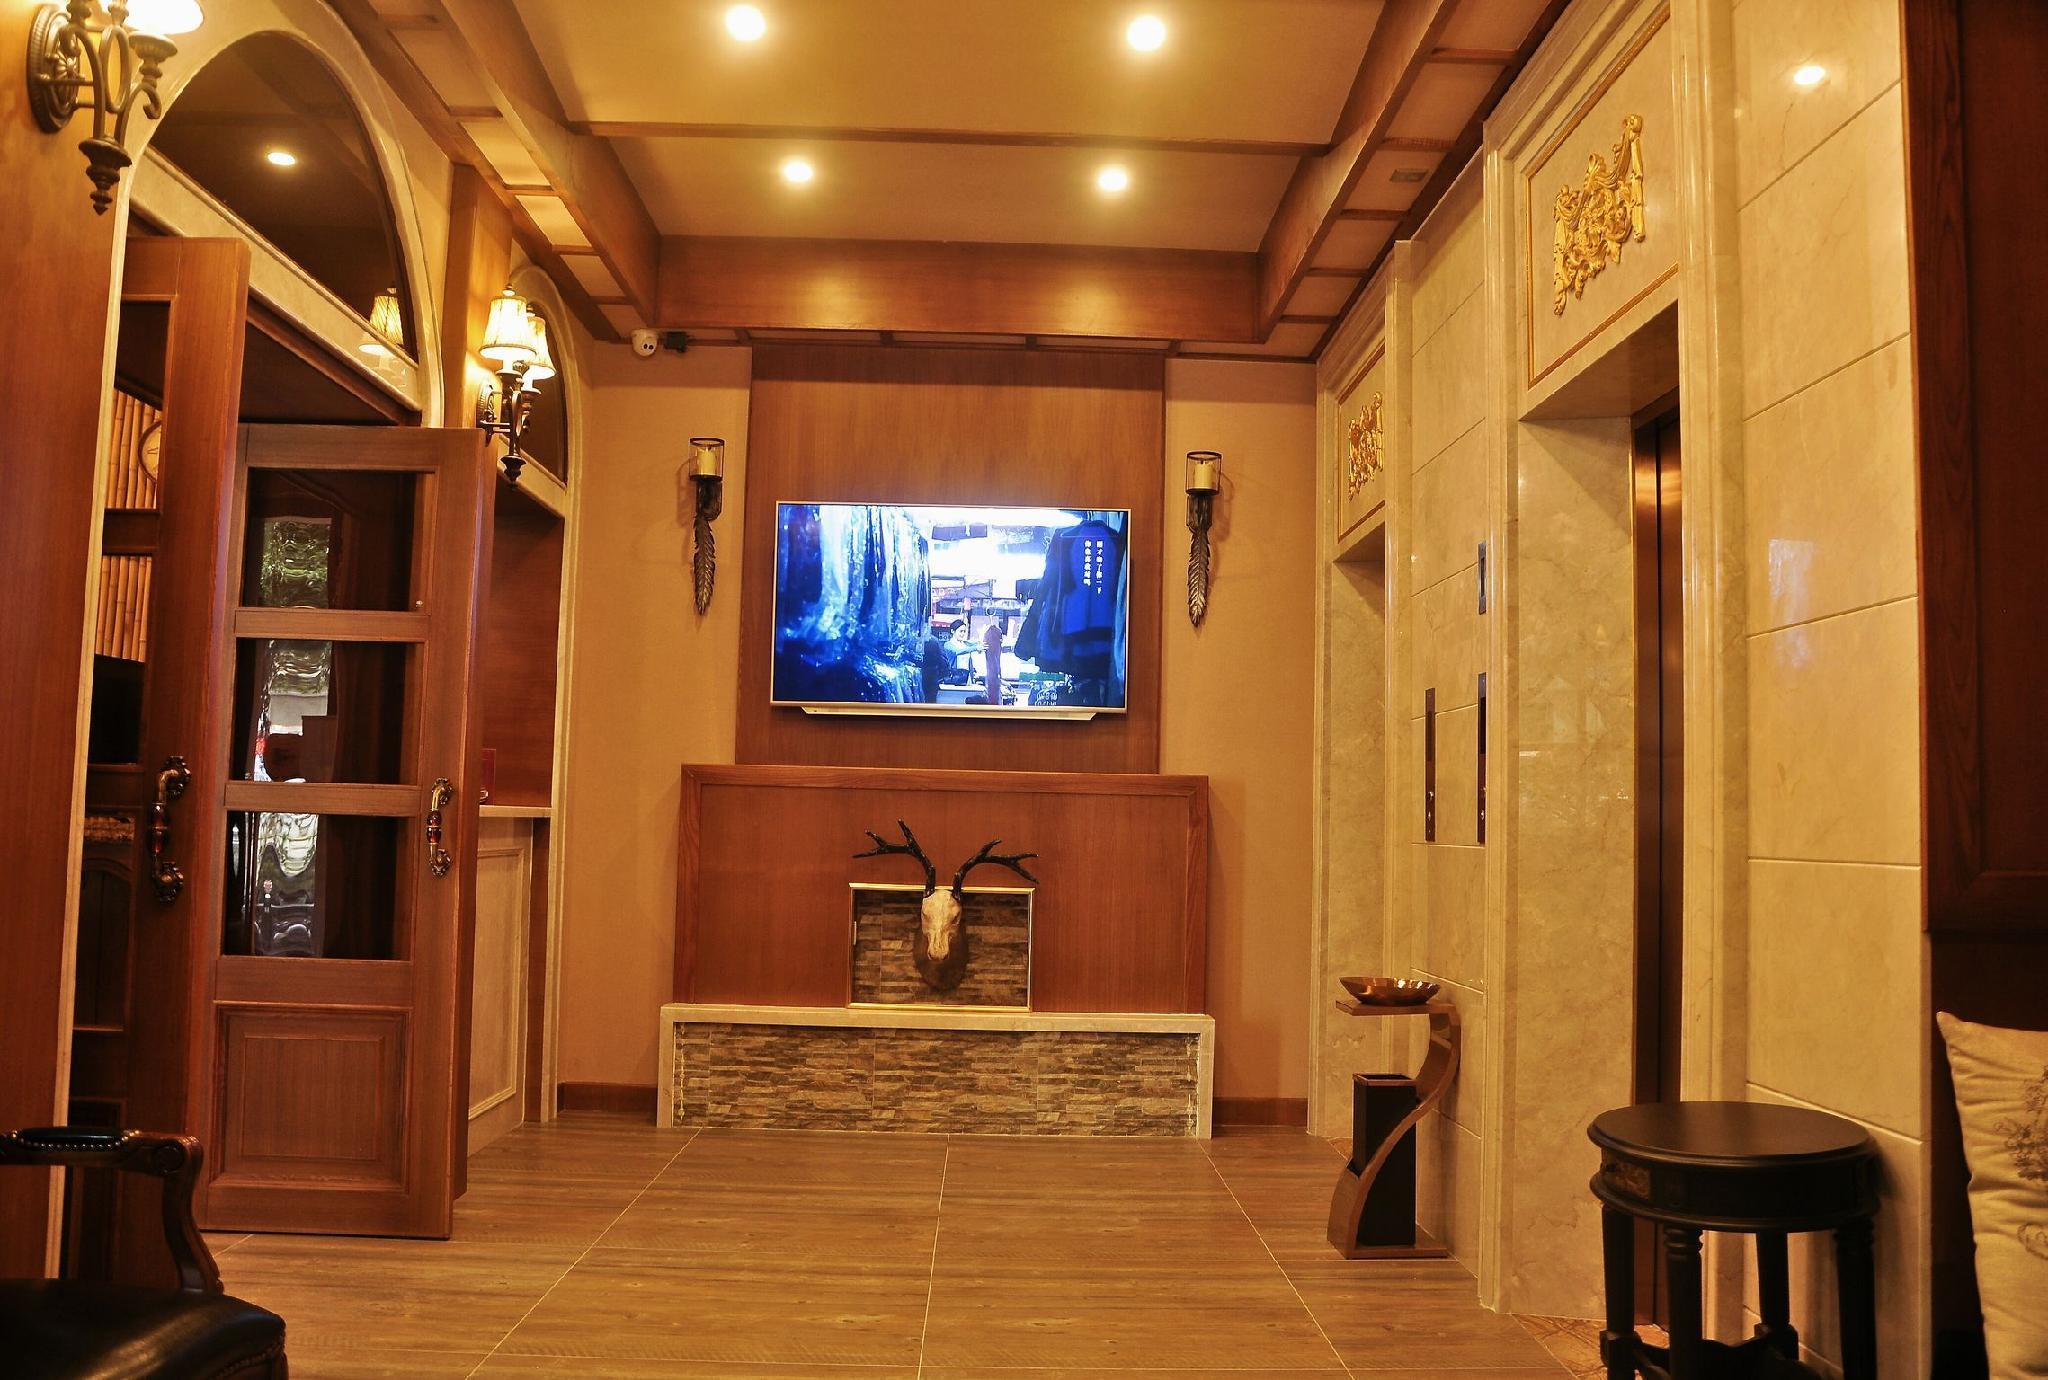 LINCOLN CARNIVAL HOTEL